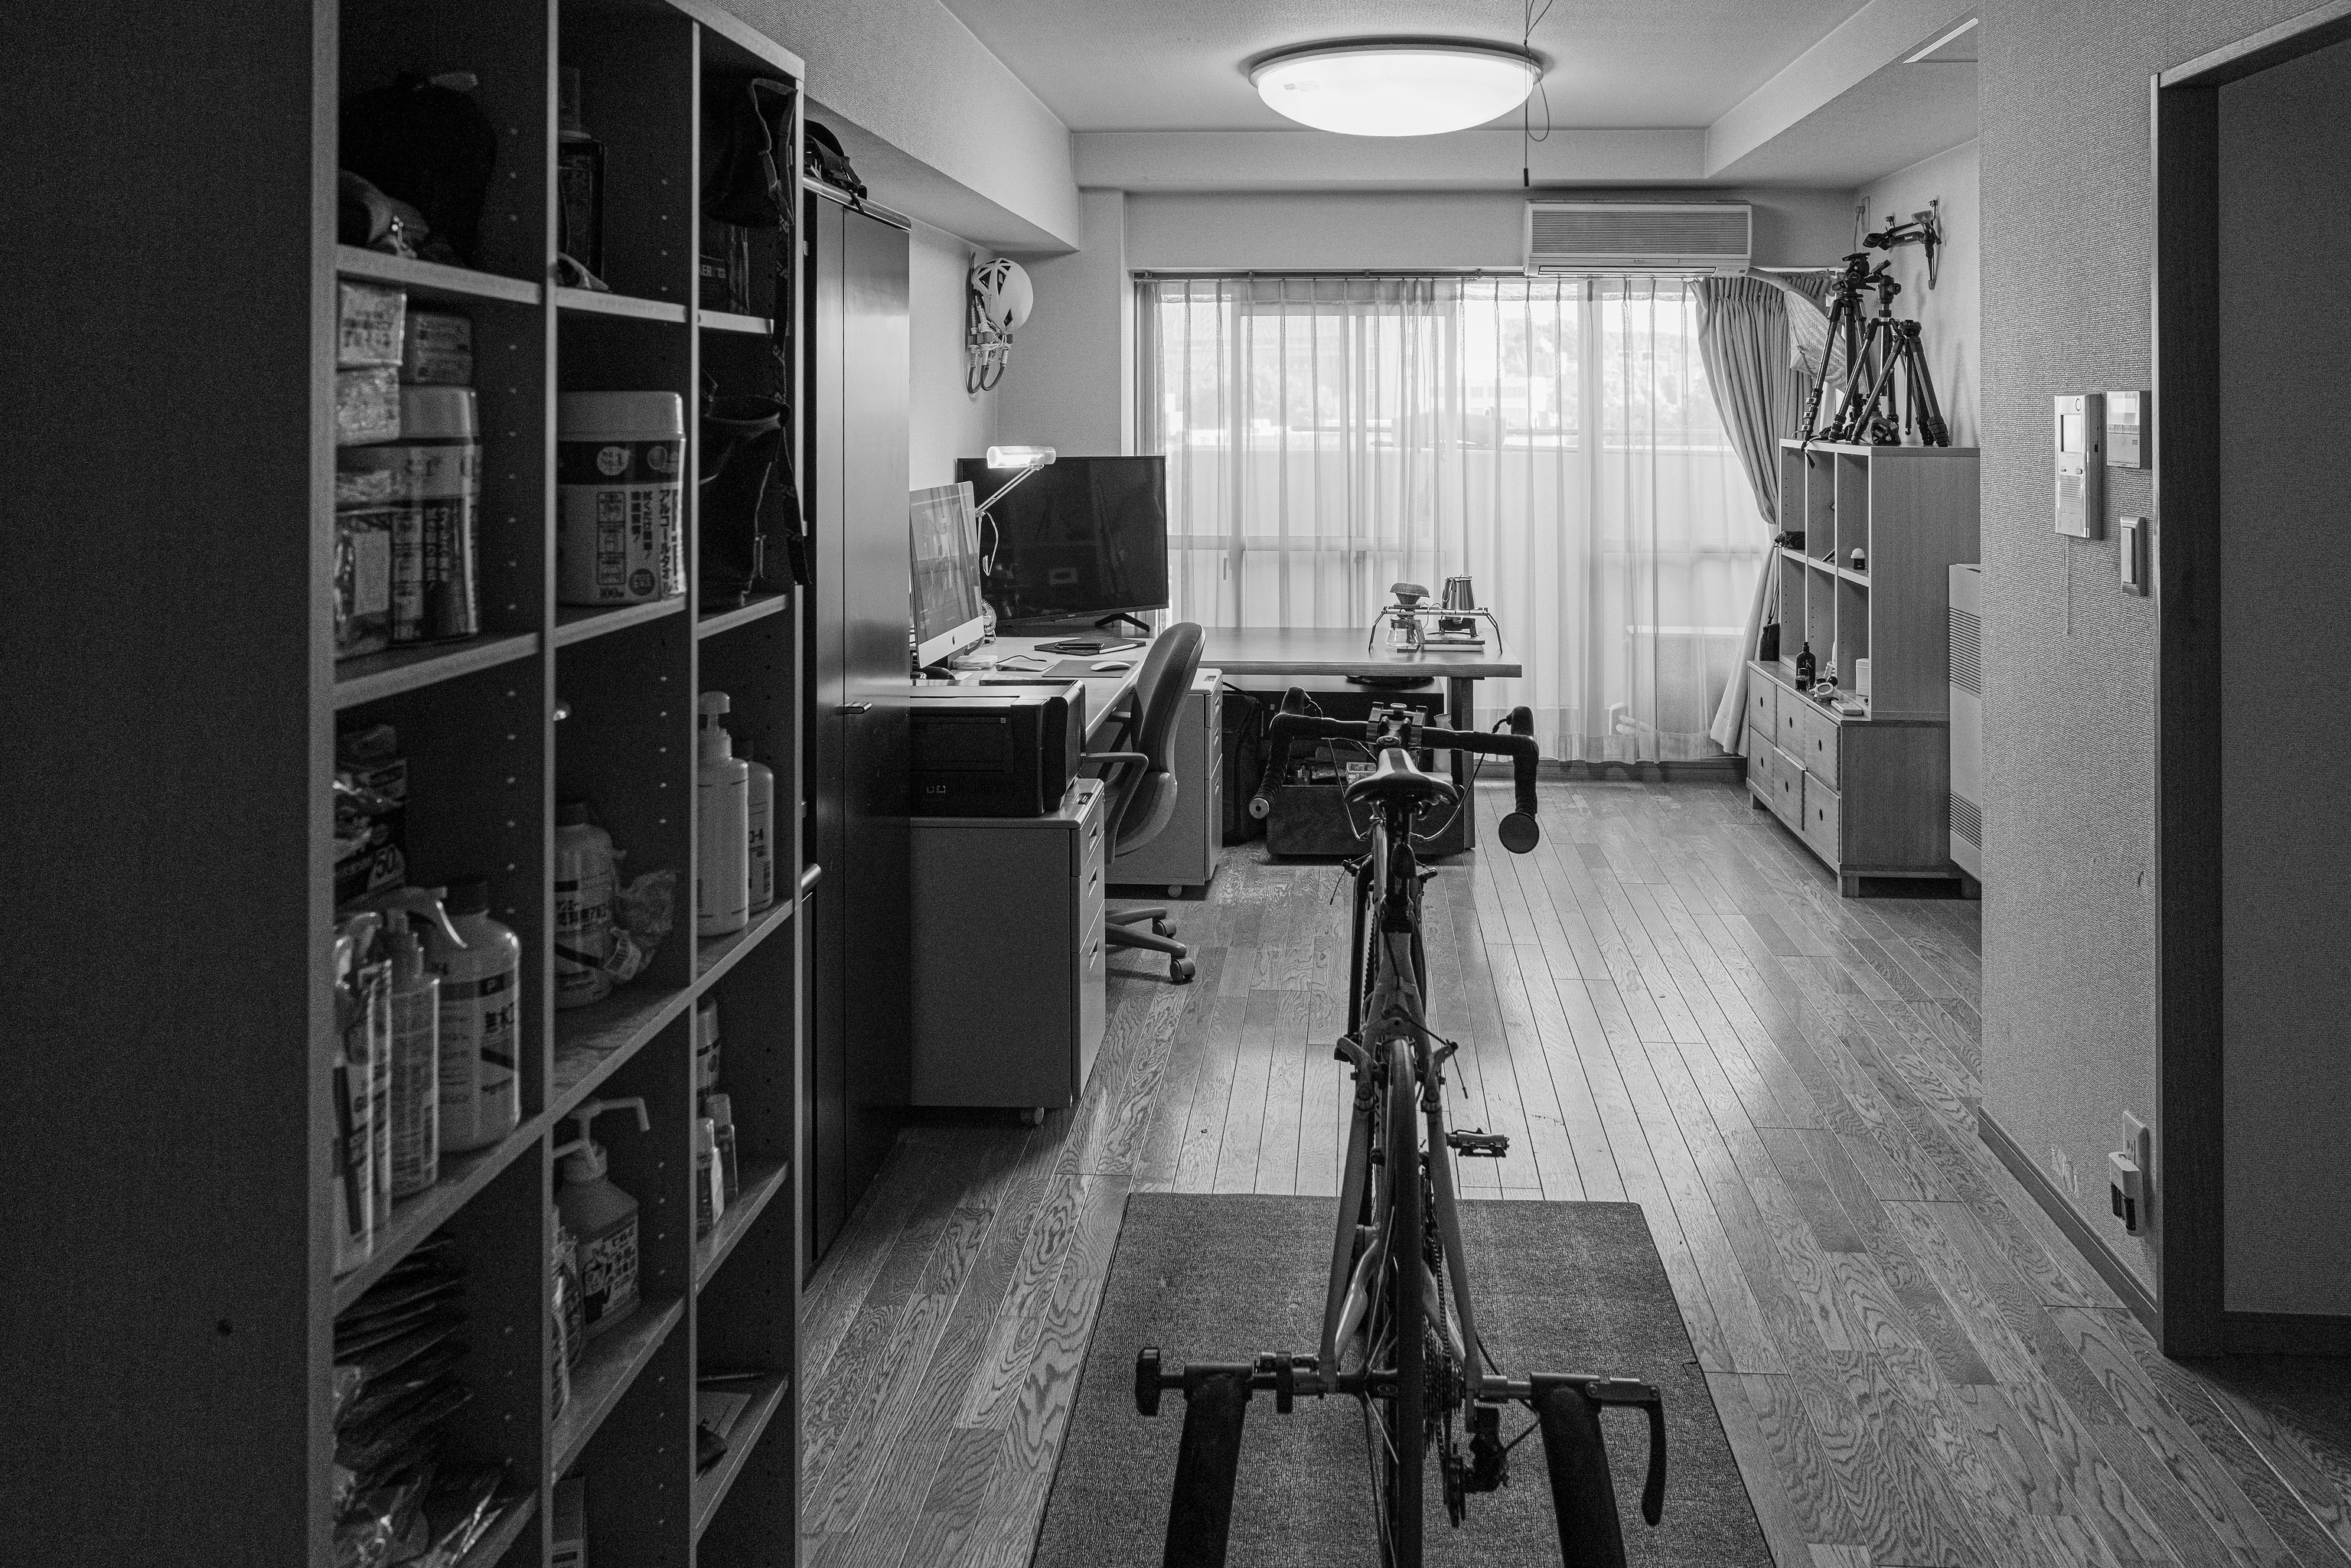 my room & my cyclocross